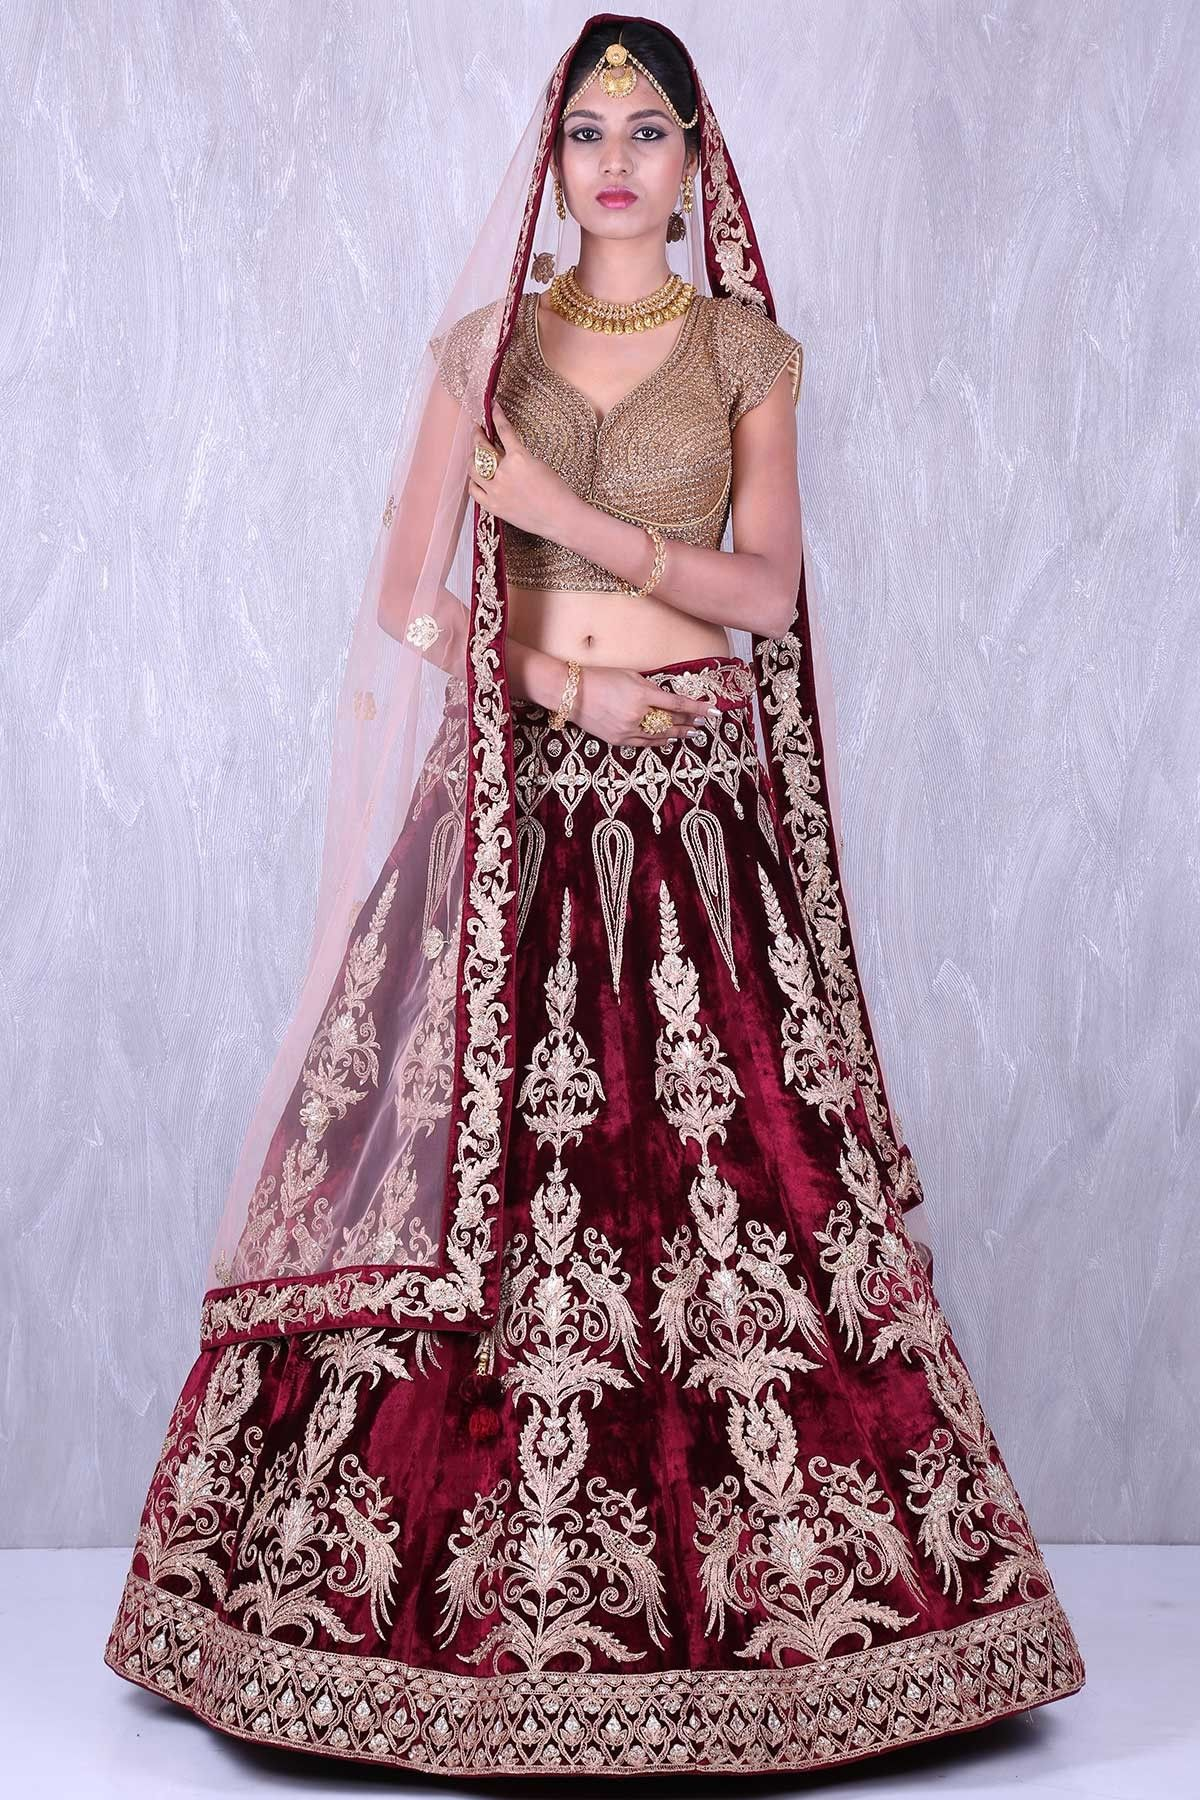 5355b05bc4 Buy Maroon & Gold enticing velvet lehenga with zardosi work Online #lehenga  #bridal #circular #indowestern #rawsilk #embroidered #zardosi #beads  #sequins ...